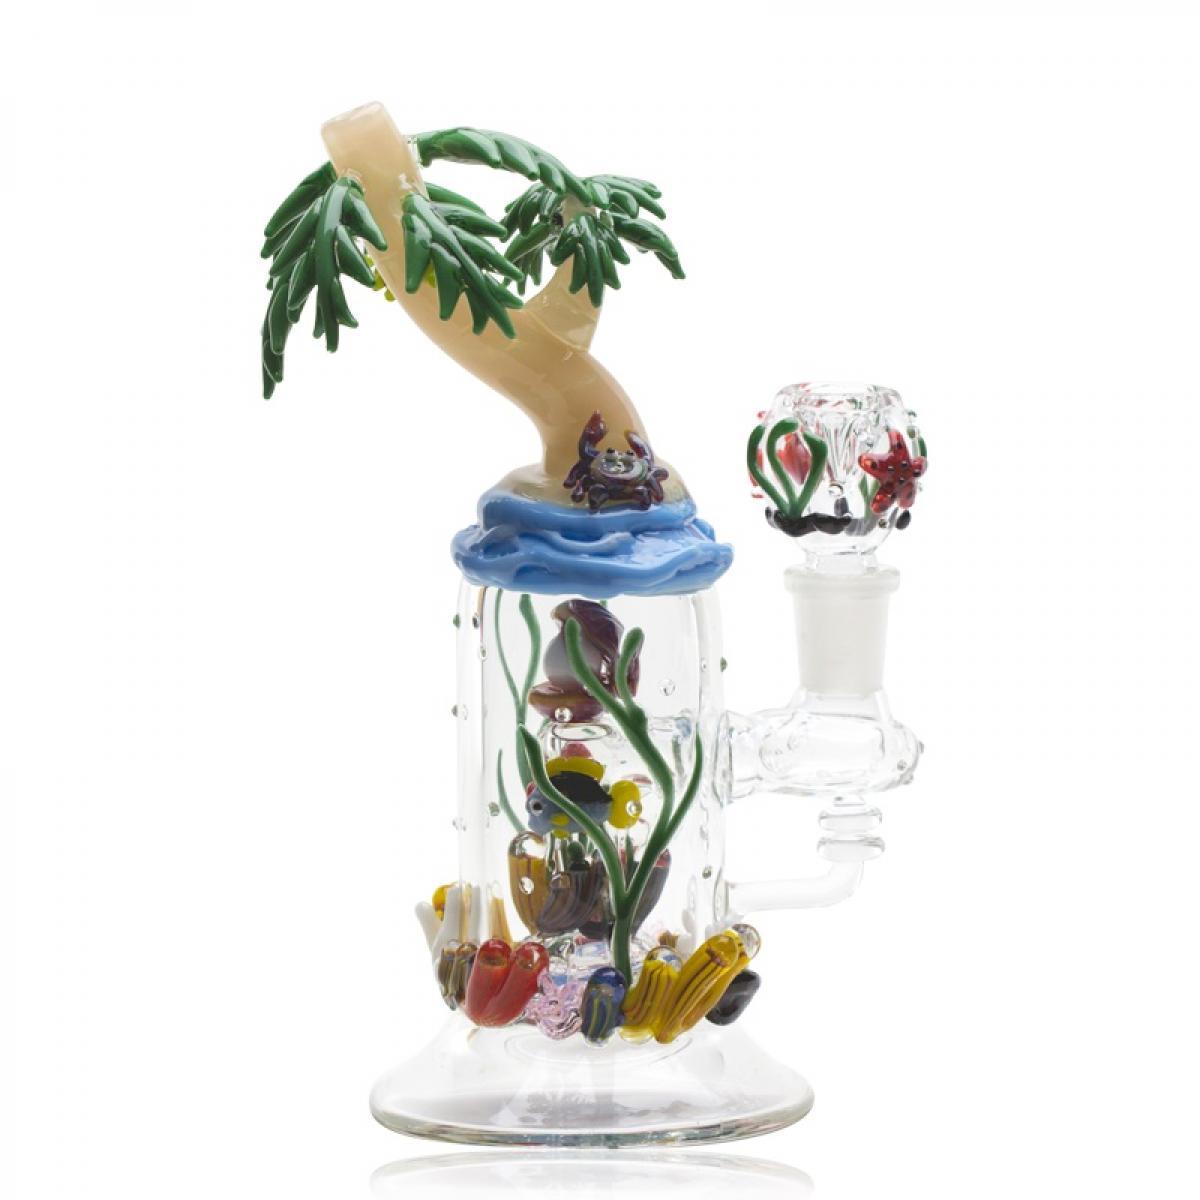 Tropical Island Mini Rig